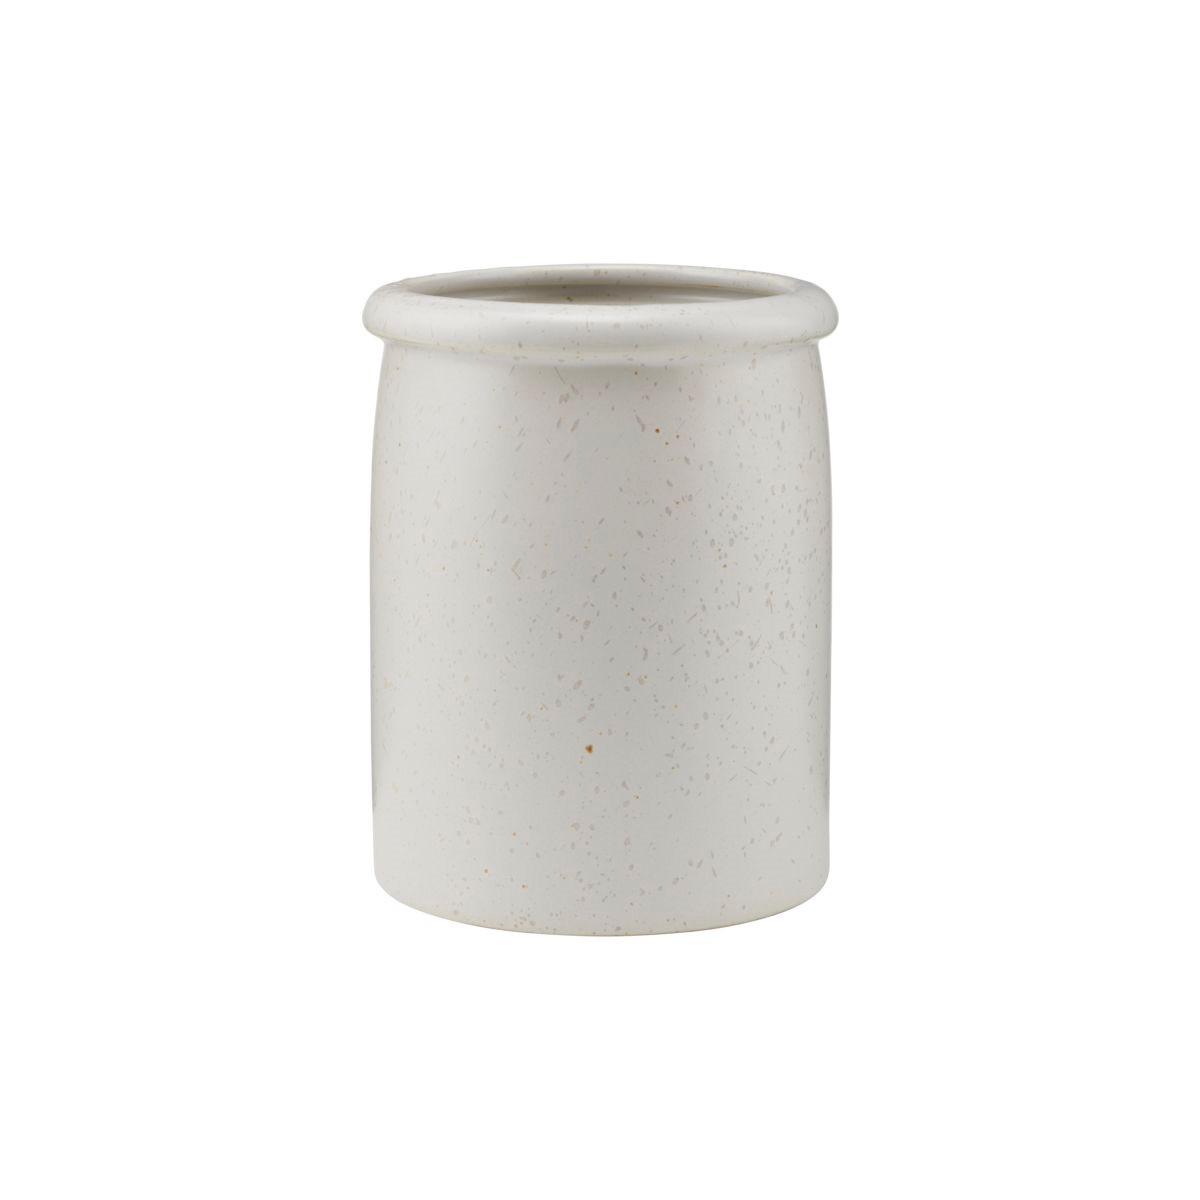 House Doctor Pion Jar Grey/White